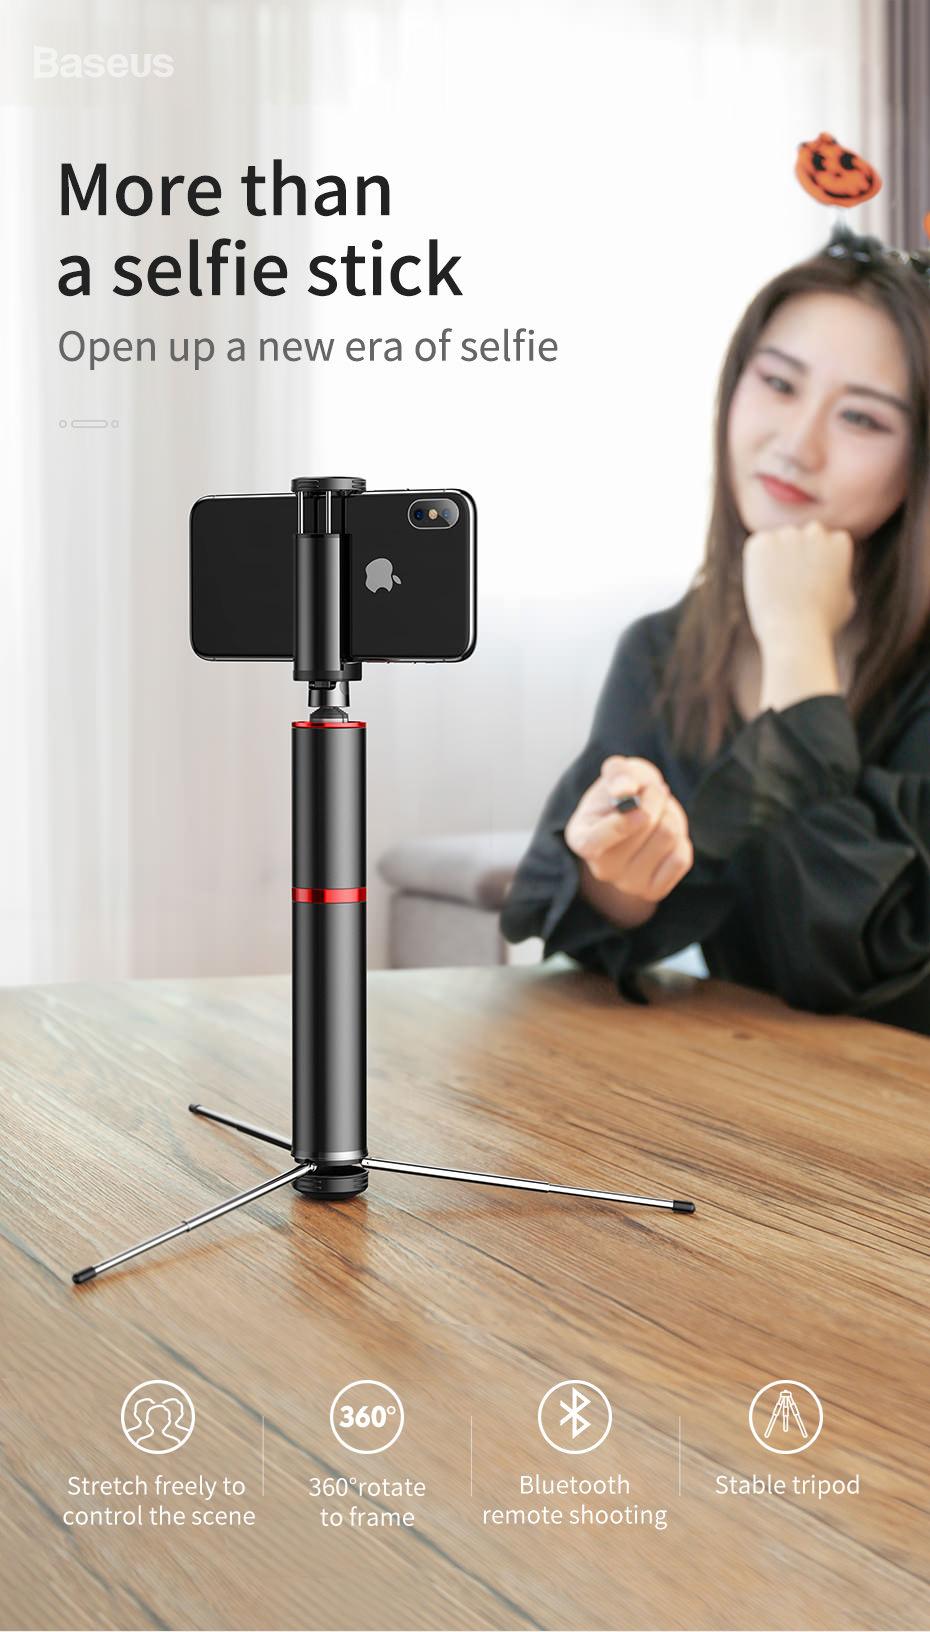 baseus intelligent selfie stick